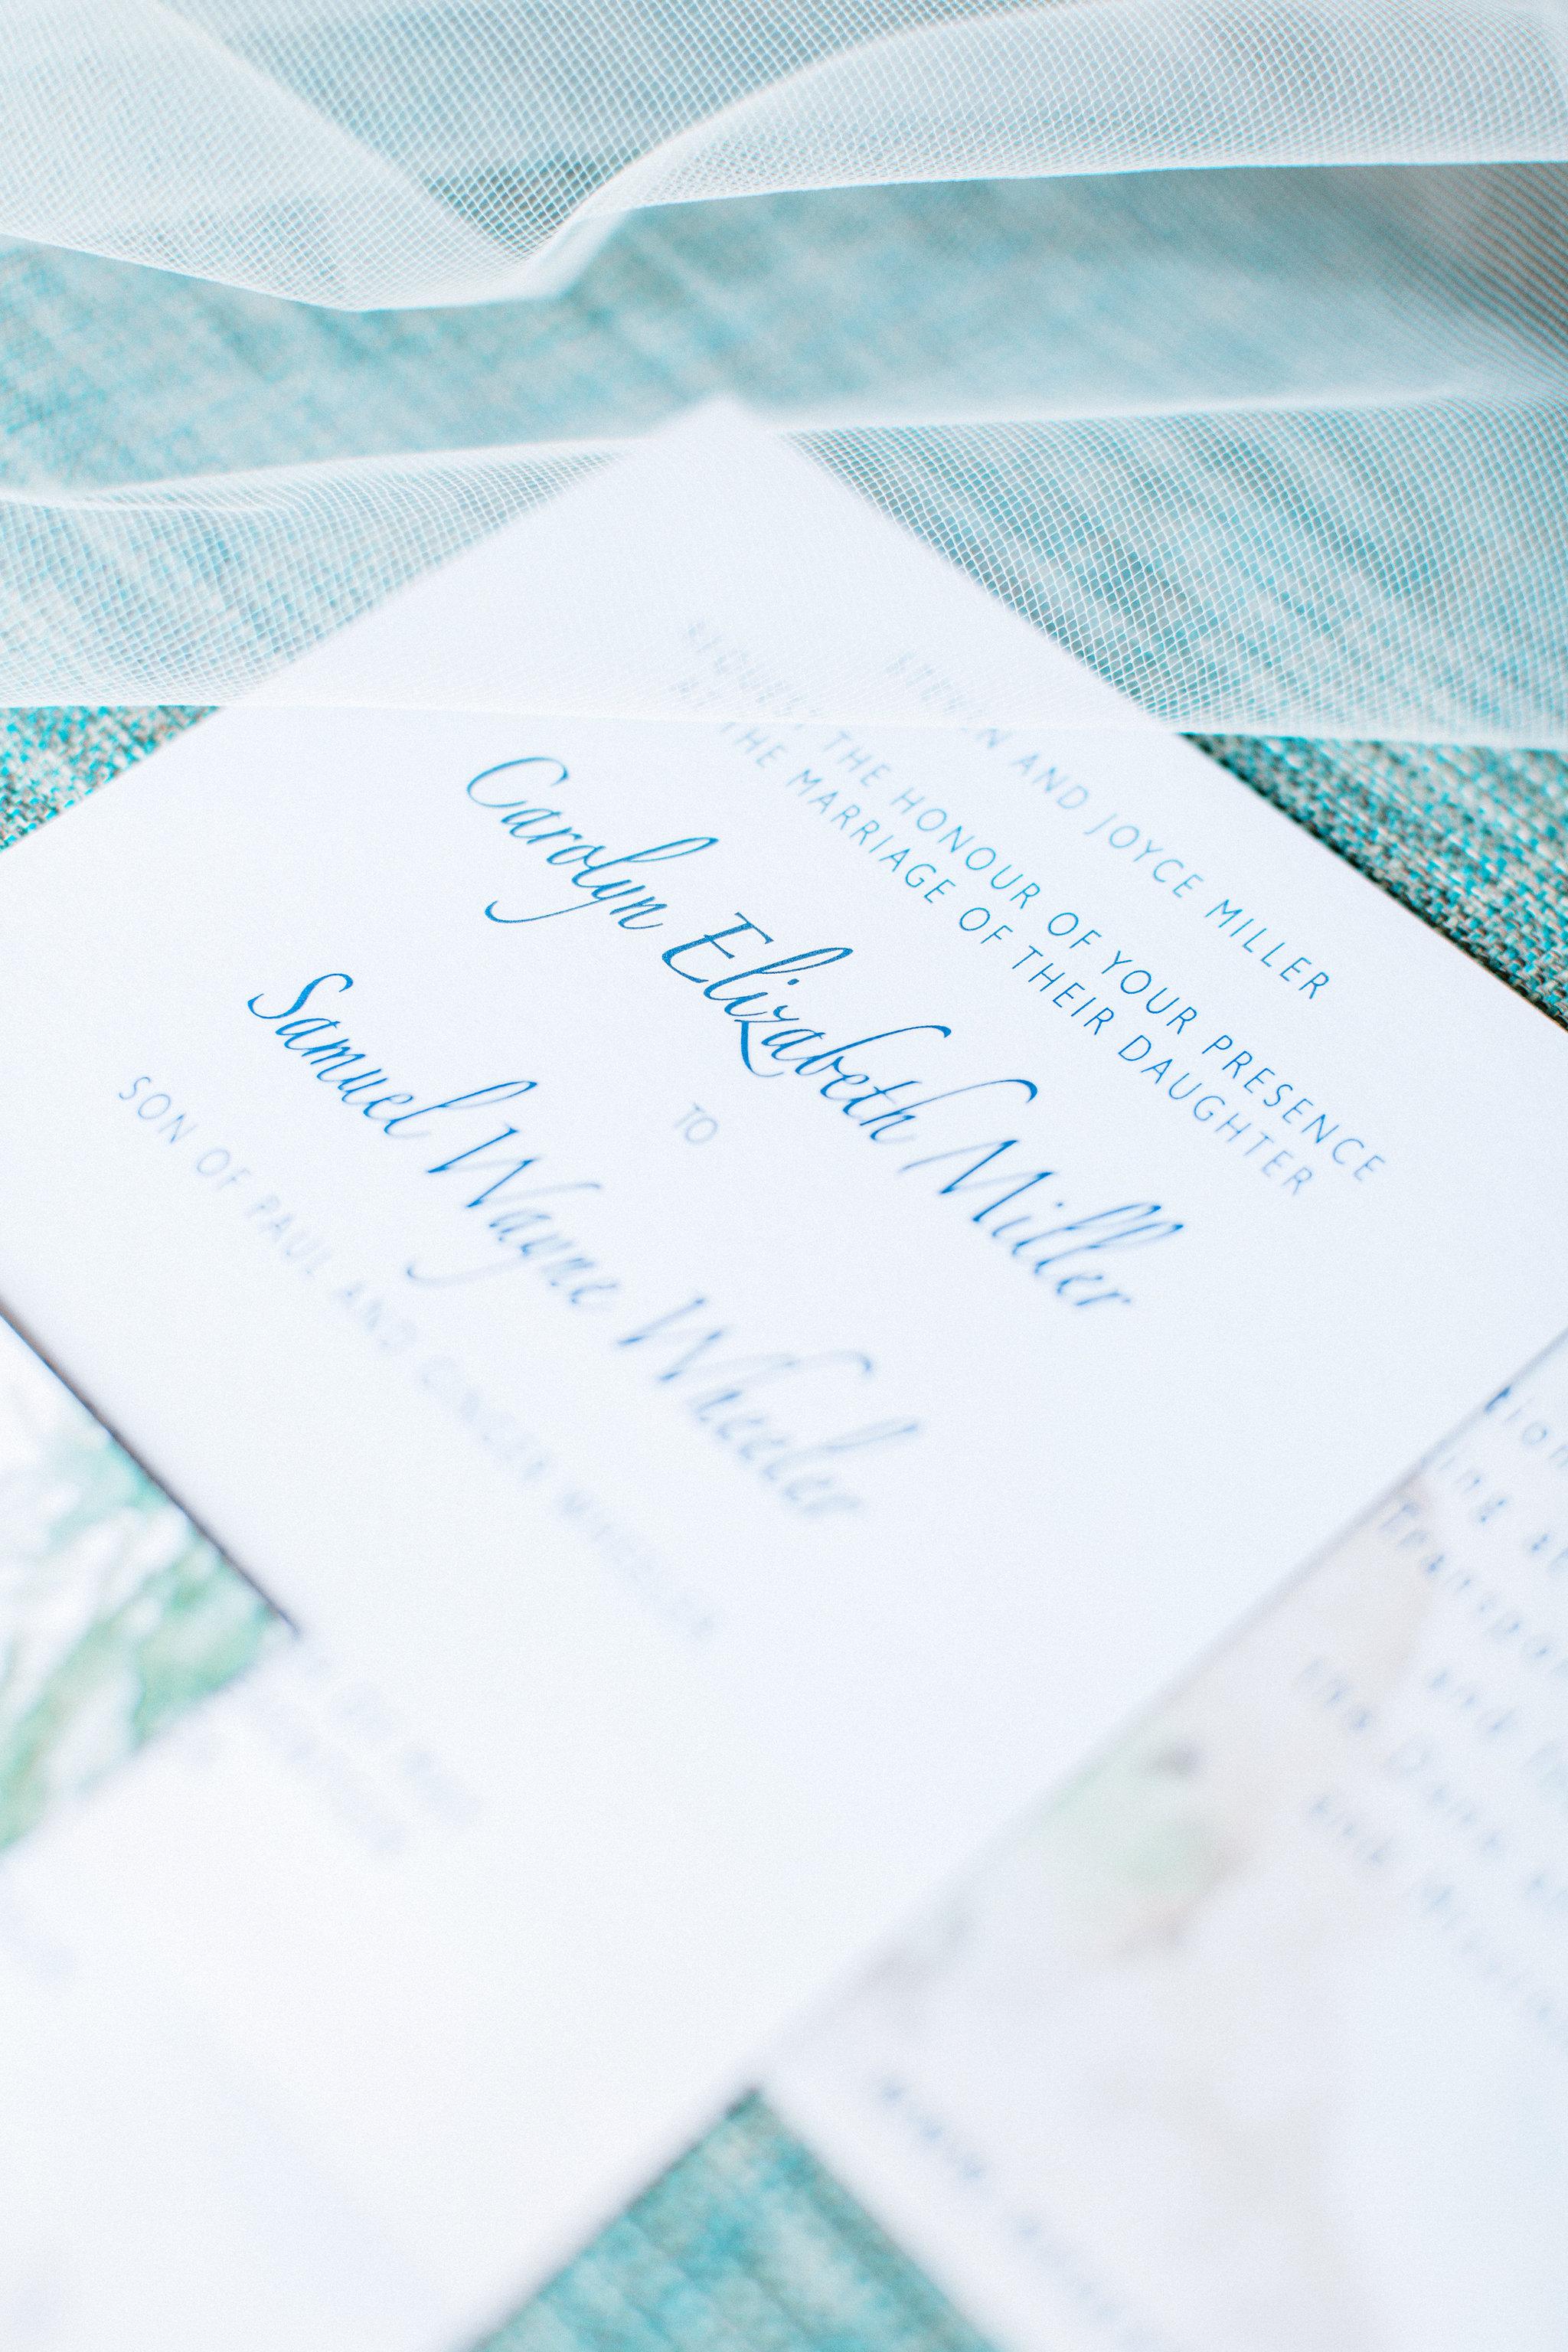 Costal California Wedding Invitation Design, 2017. Photo by  Pauline Conway Photography .